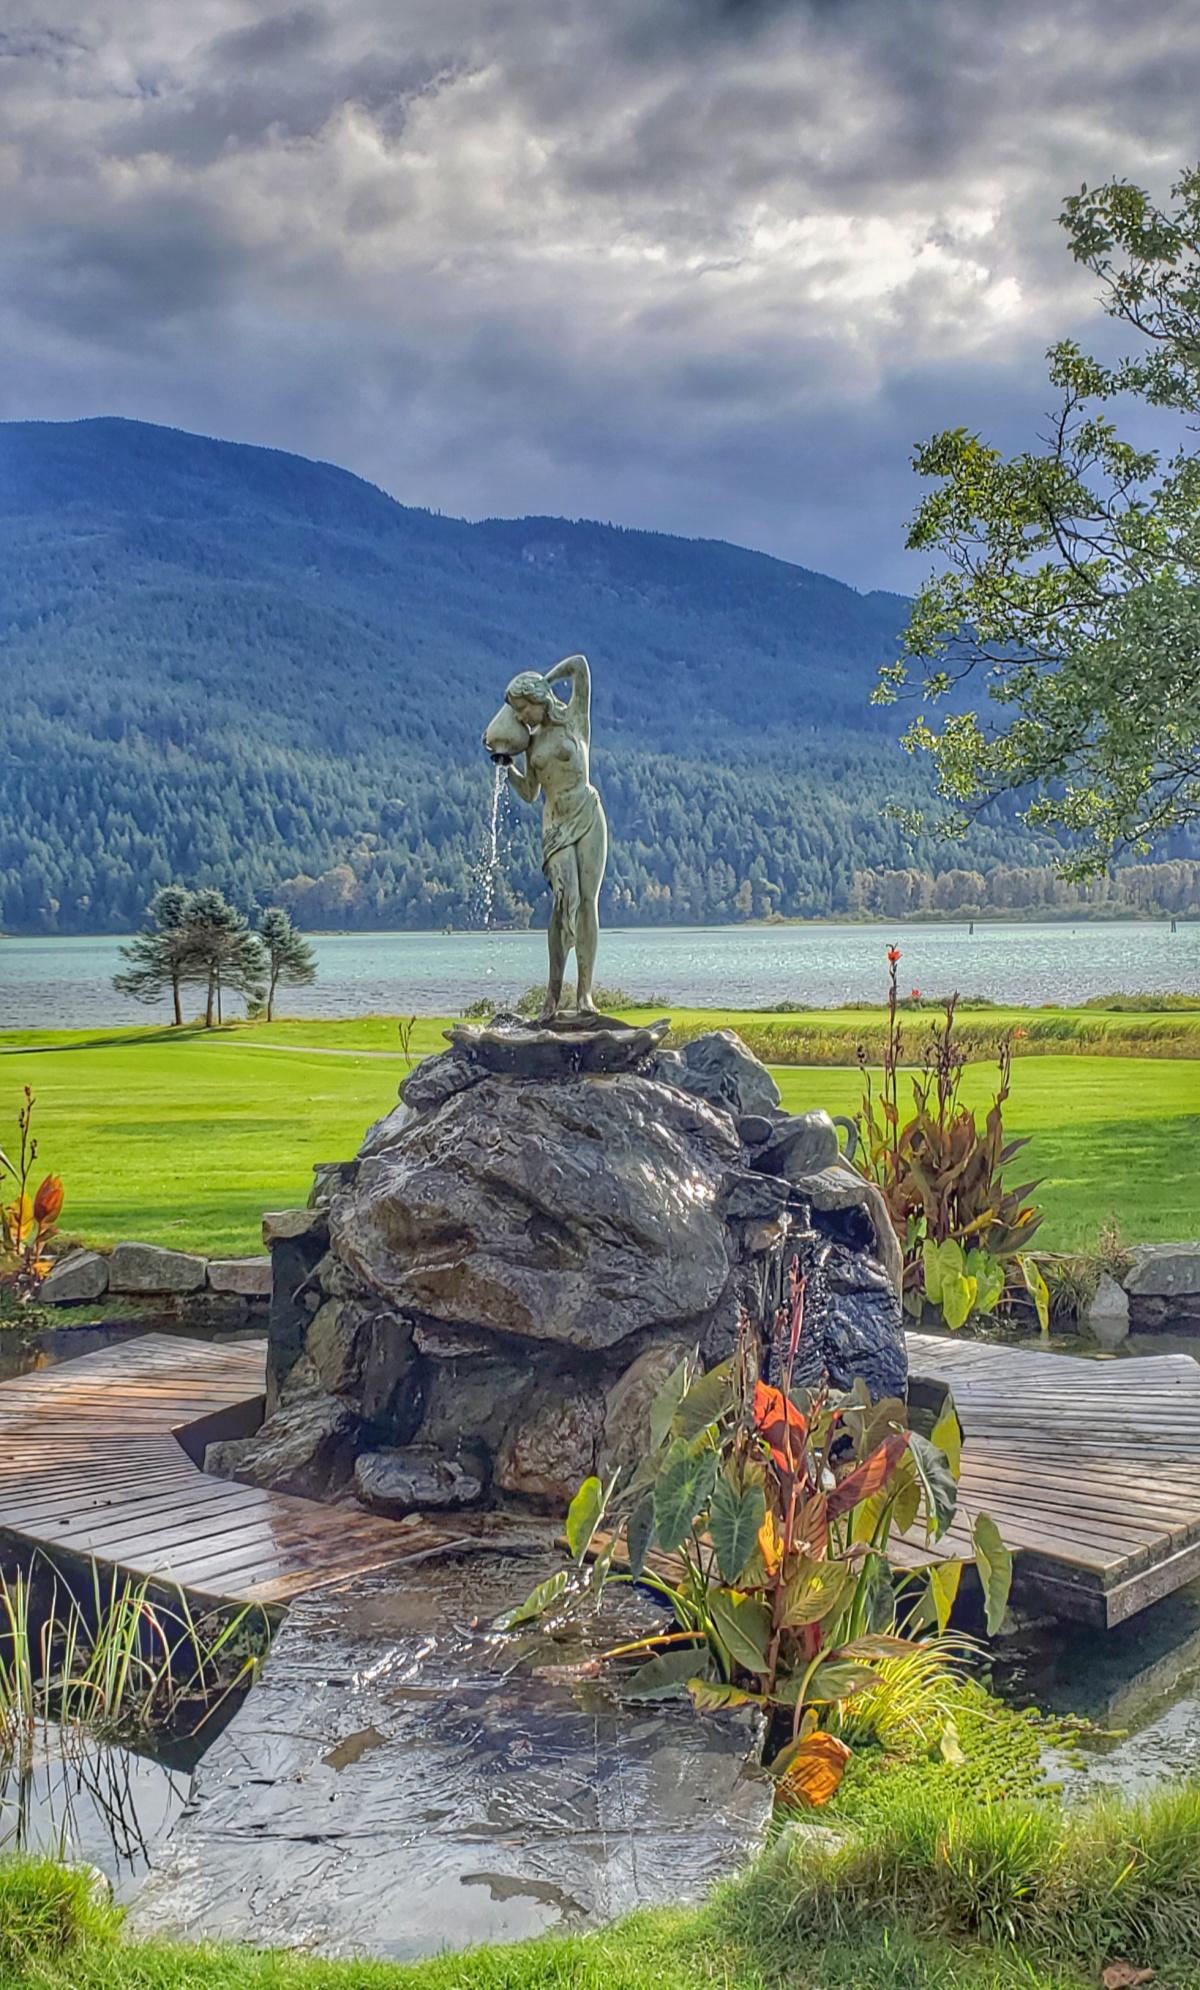 Sandpiper resort golf course